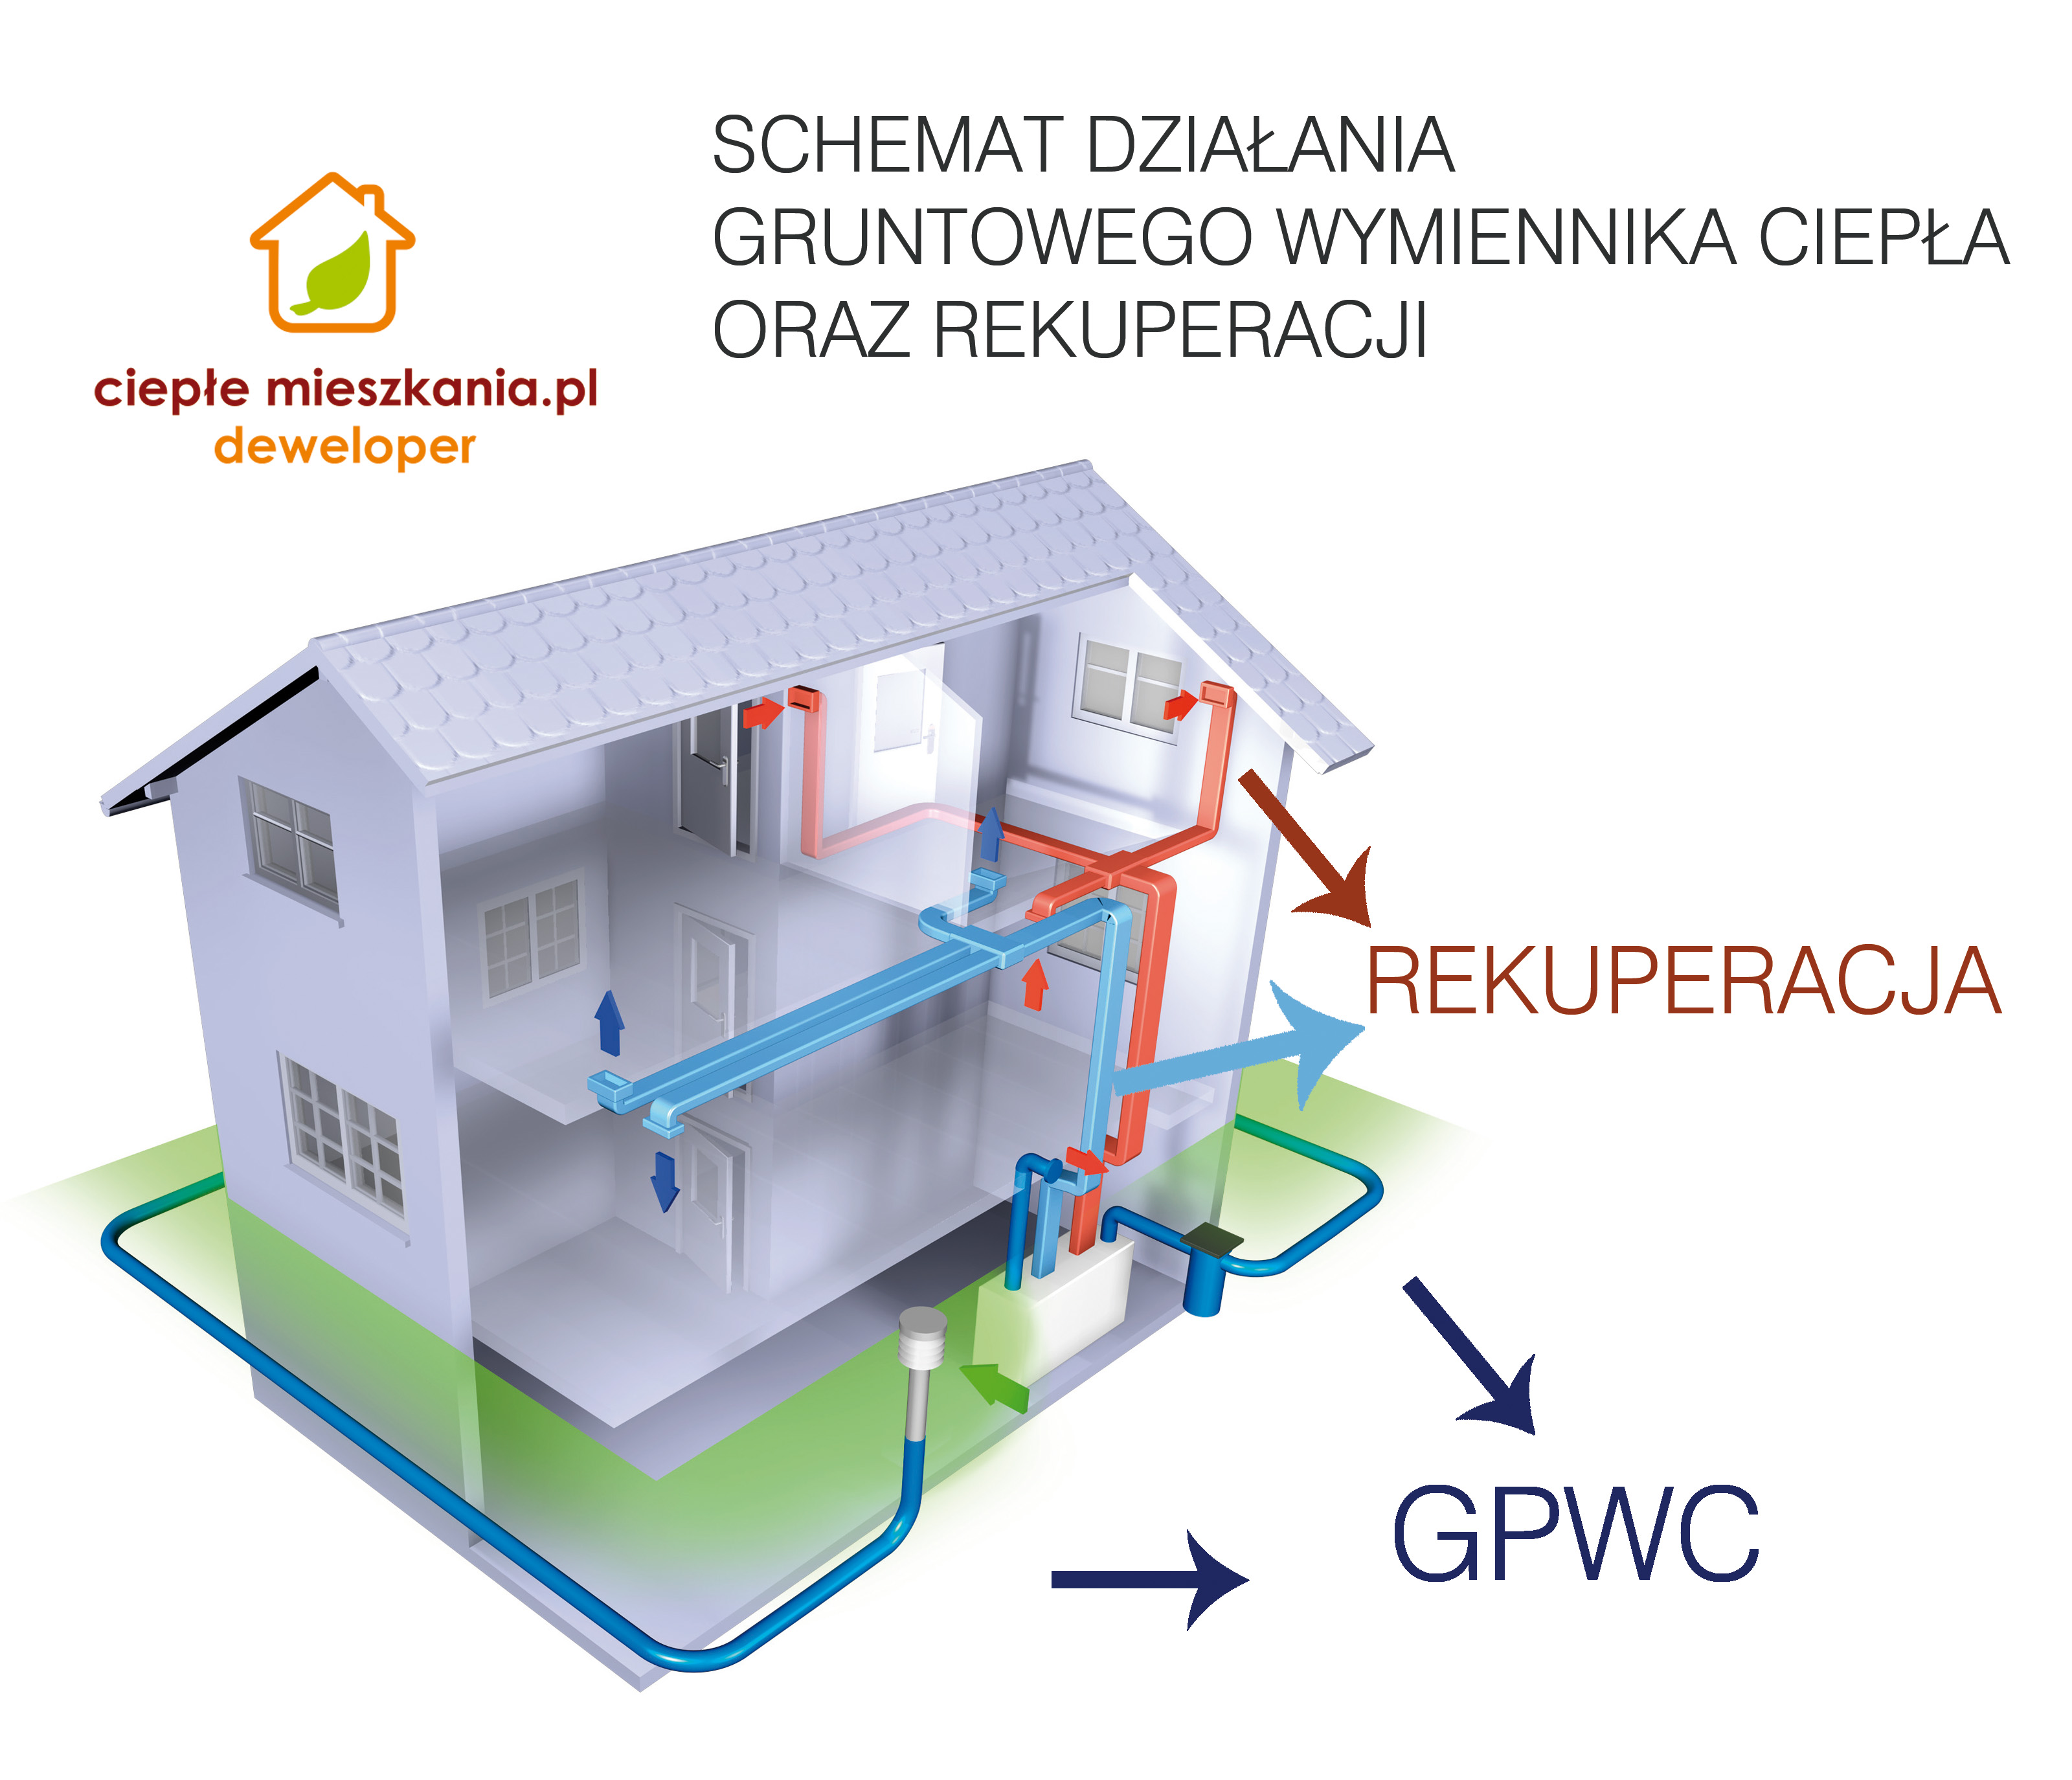 www GPWC REKUPERACJA